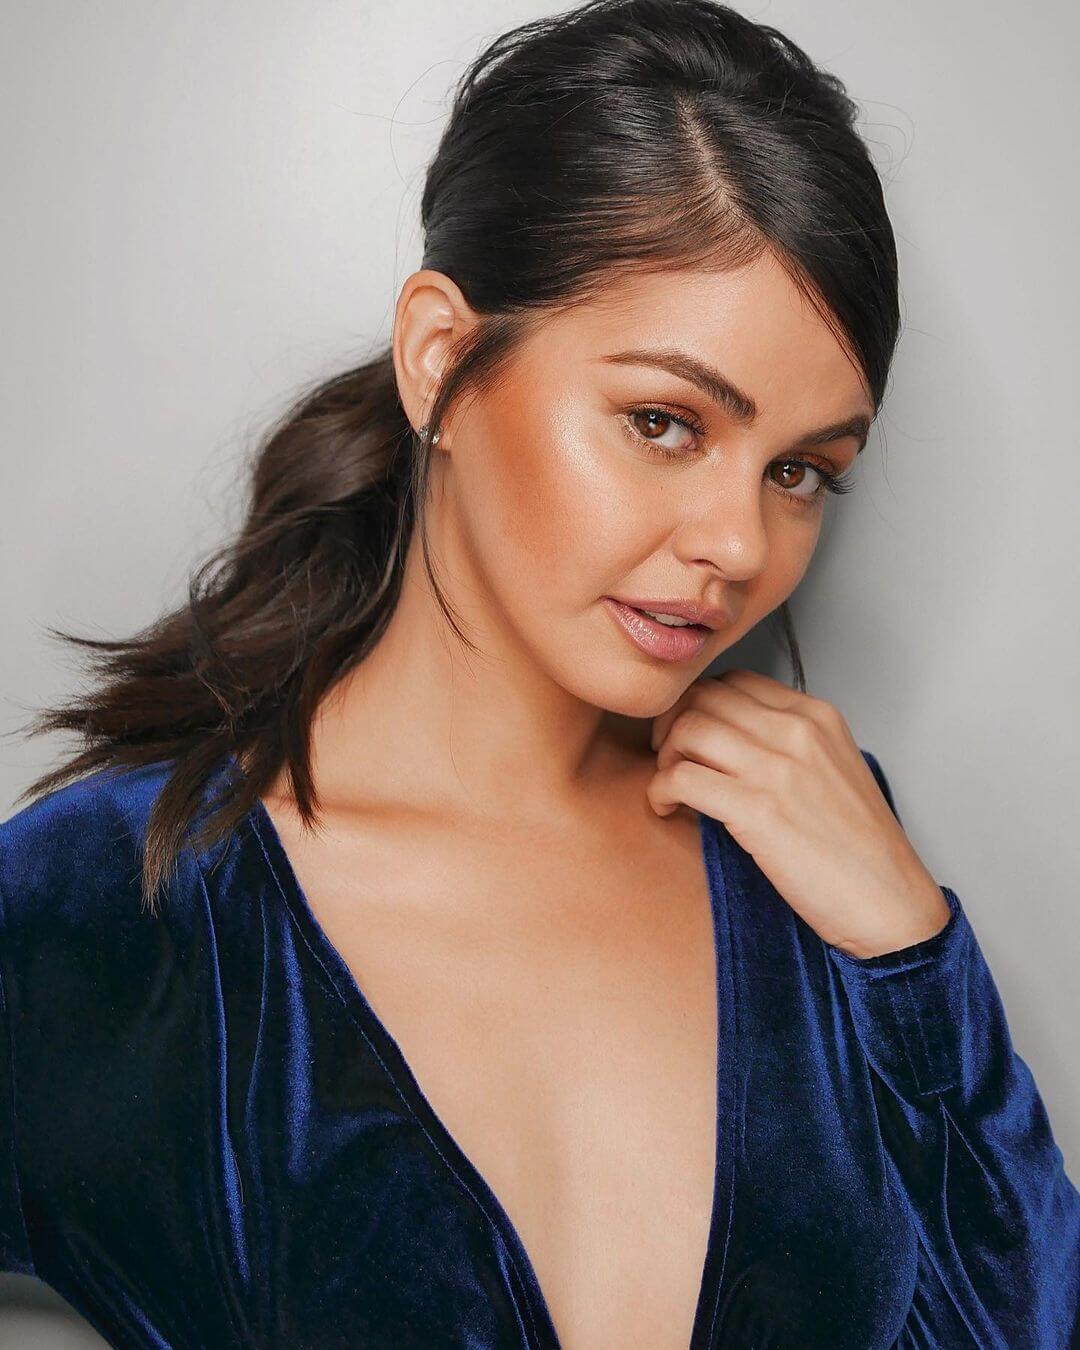 Model Janine Gutierrez